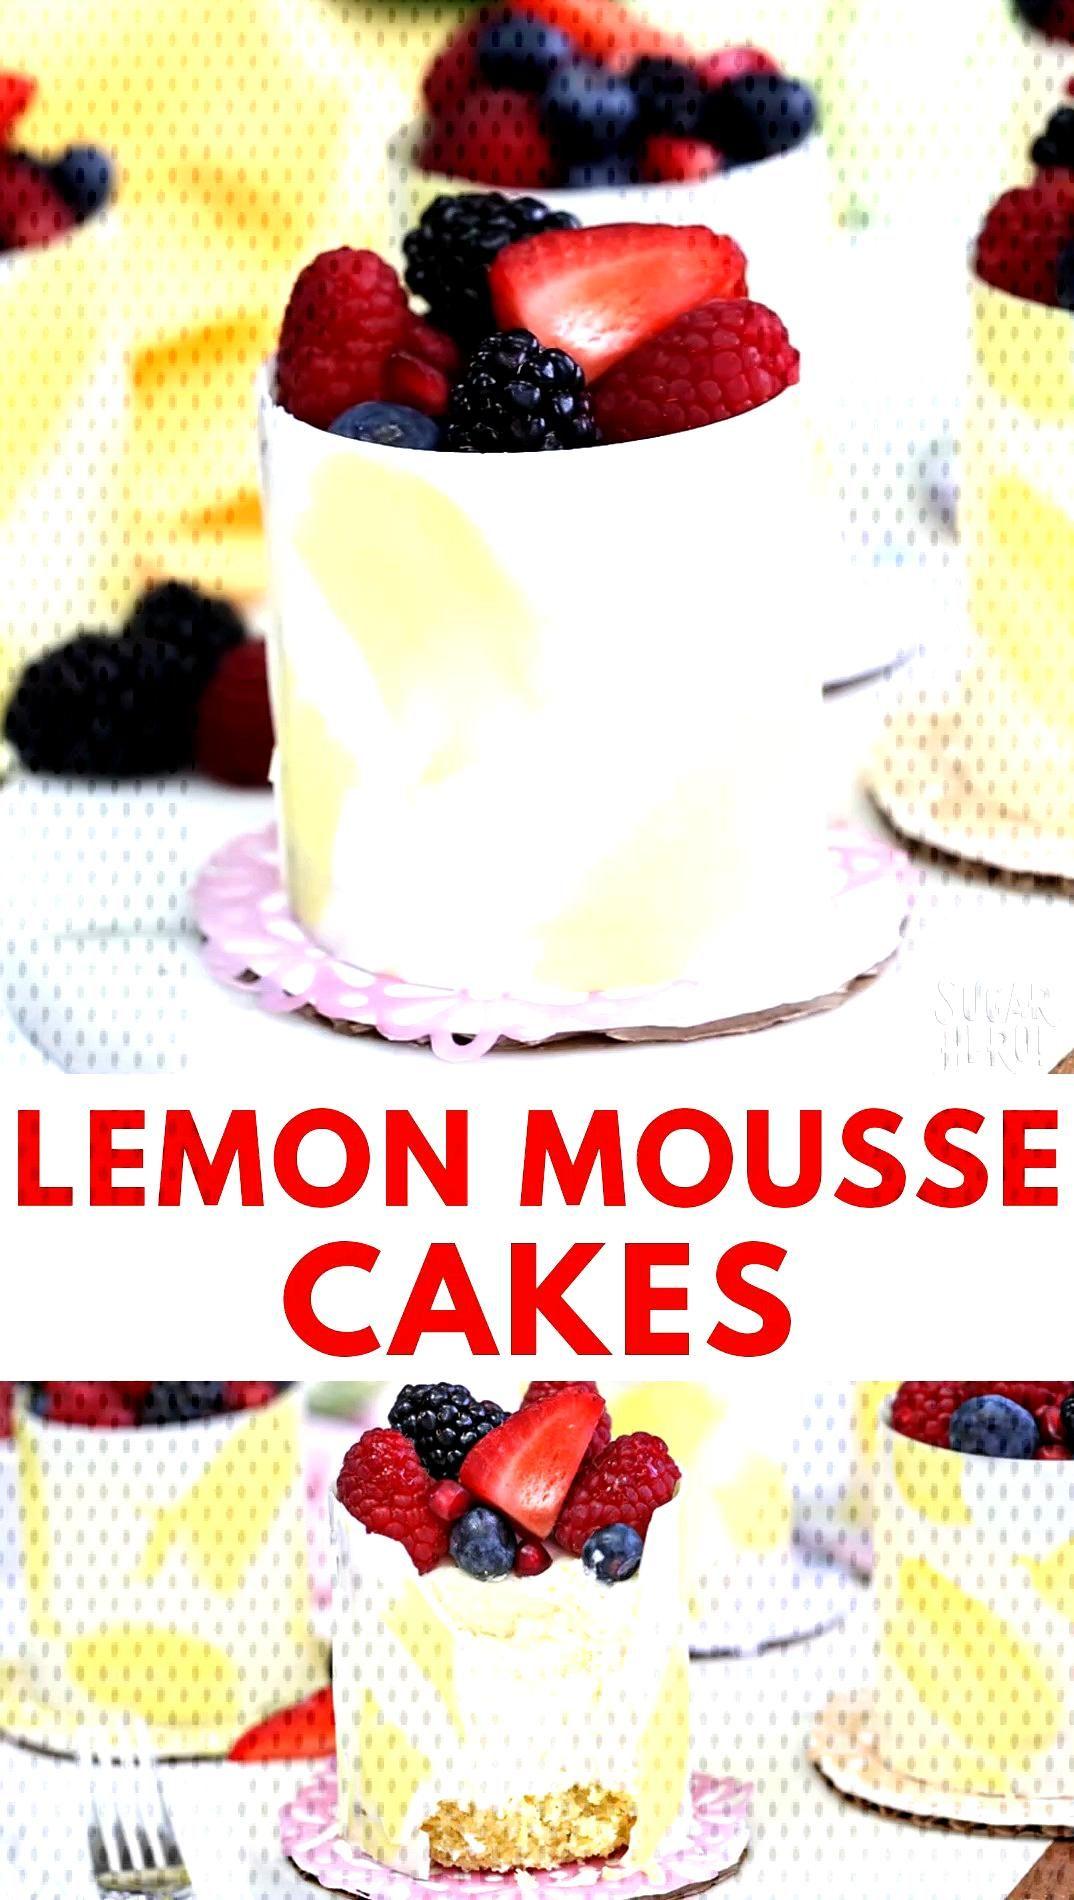 Lemon Mousse Cakes in White Chocolate Shells are miniature desserts made with lemon cake, lemon mou